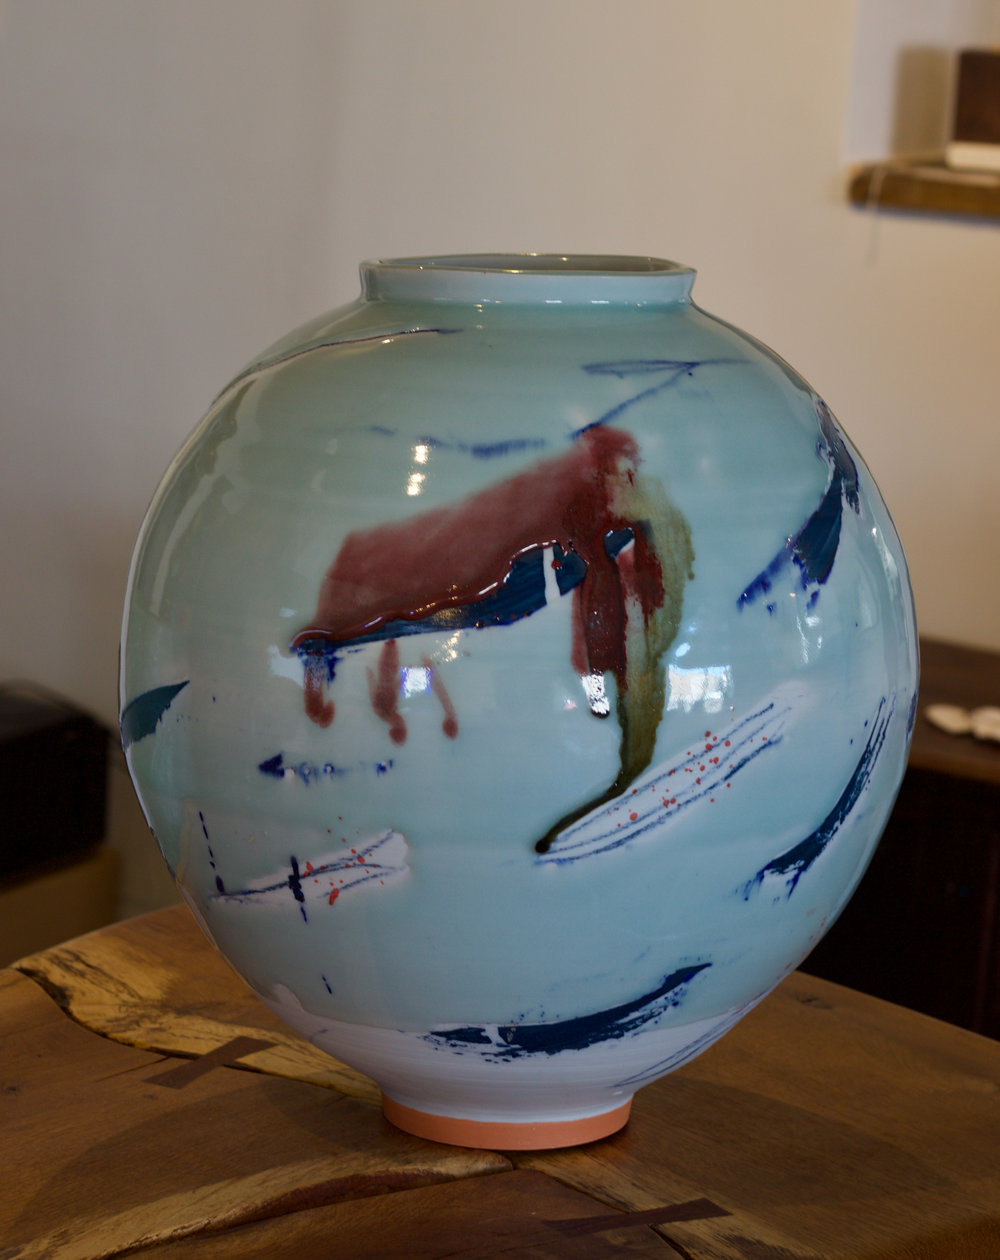 Adam Frew - Porcelain Moon Jar - 37cm by 34cm - £900.00